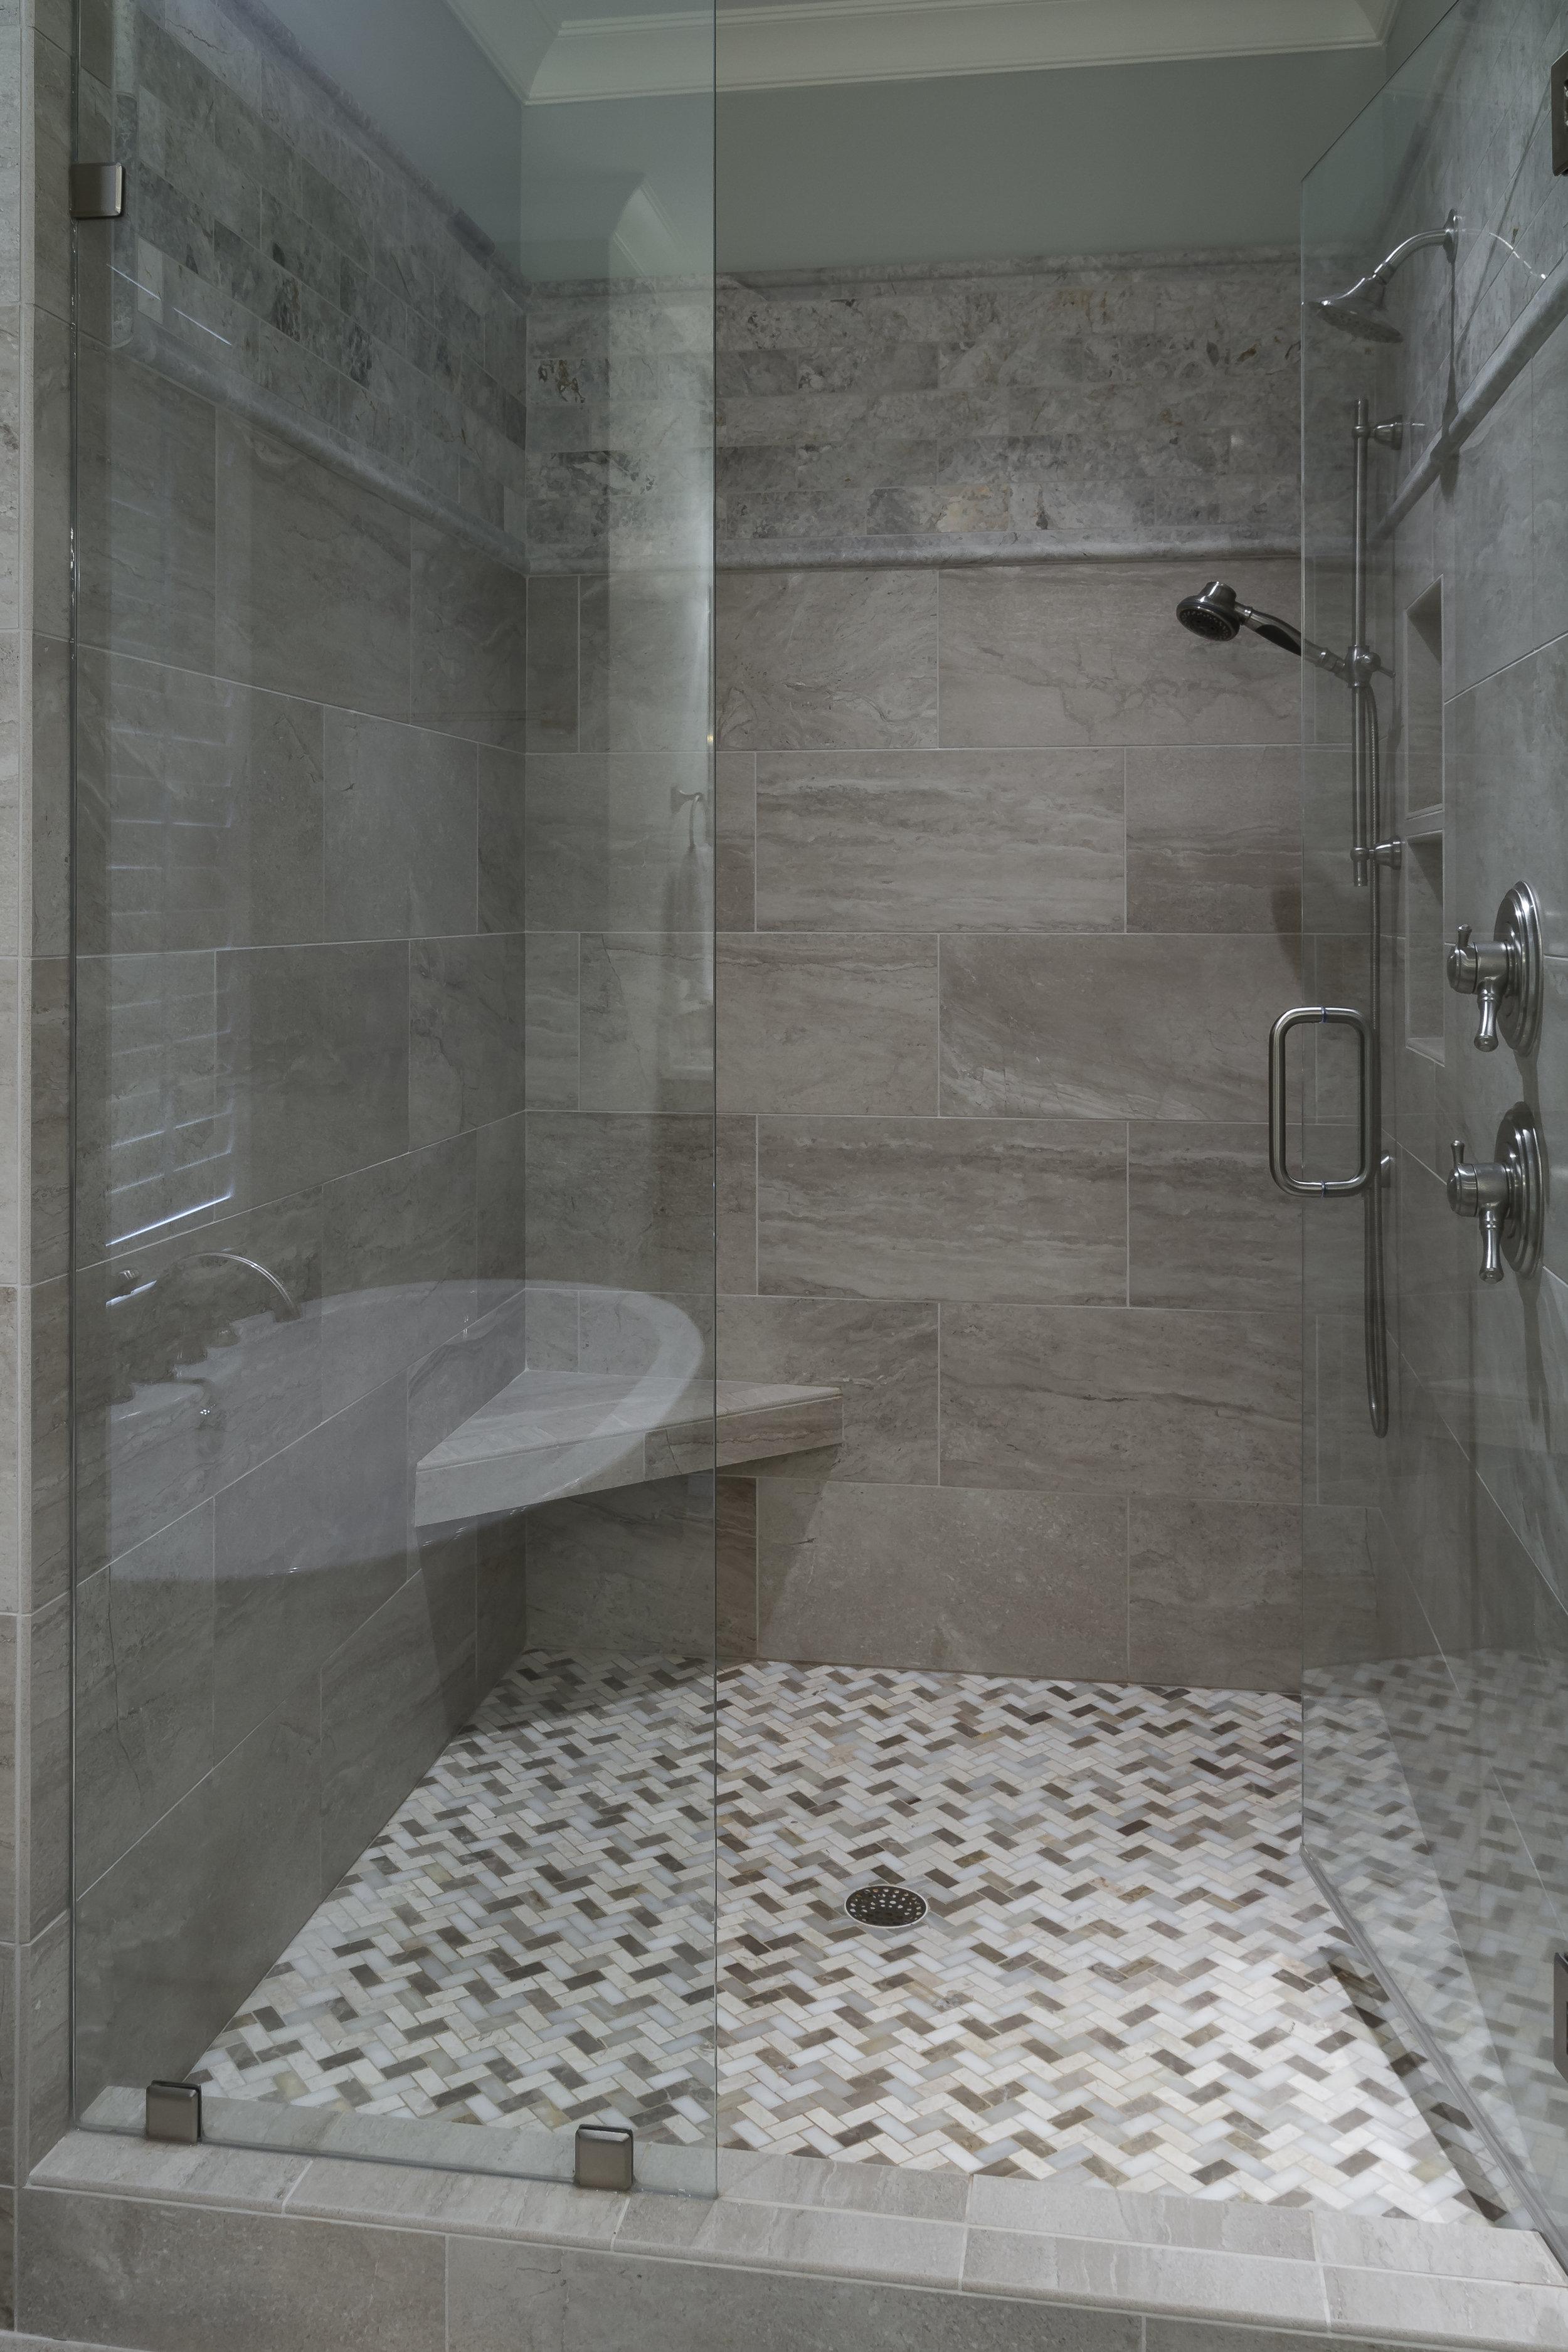 Spain-Construction-Charlotte-Kitchen-and-Bath-56.jpg